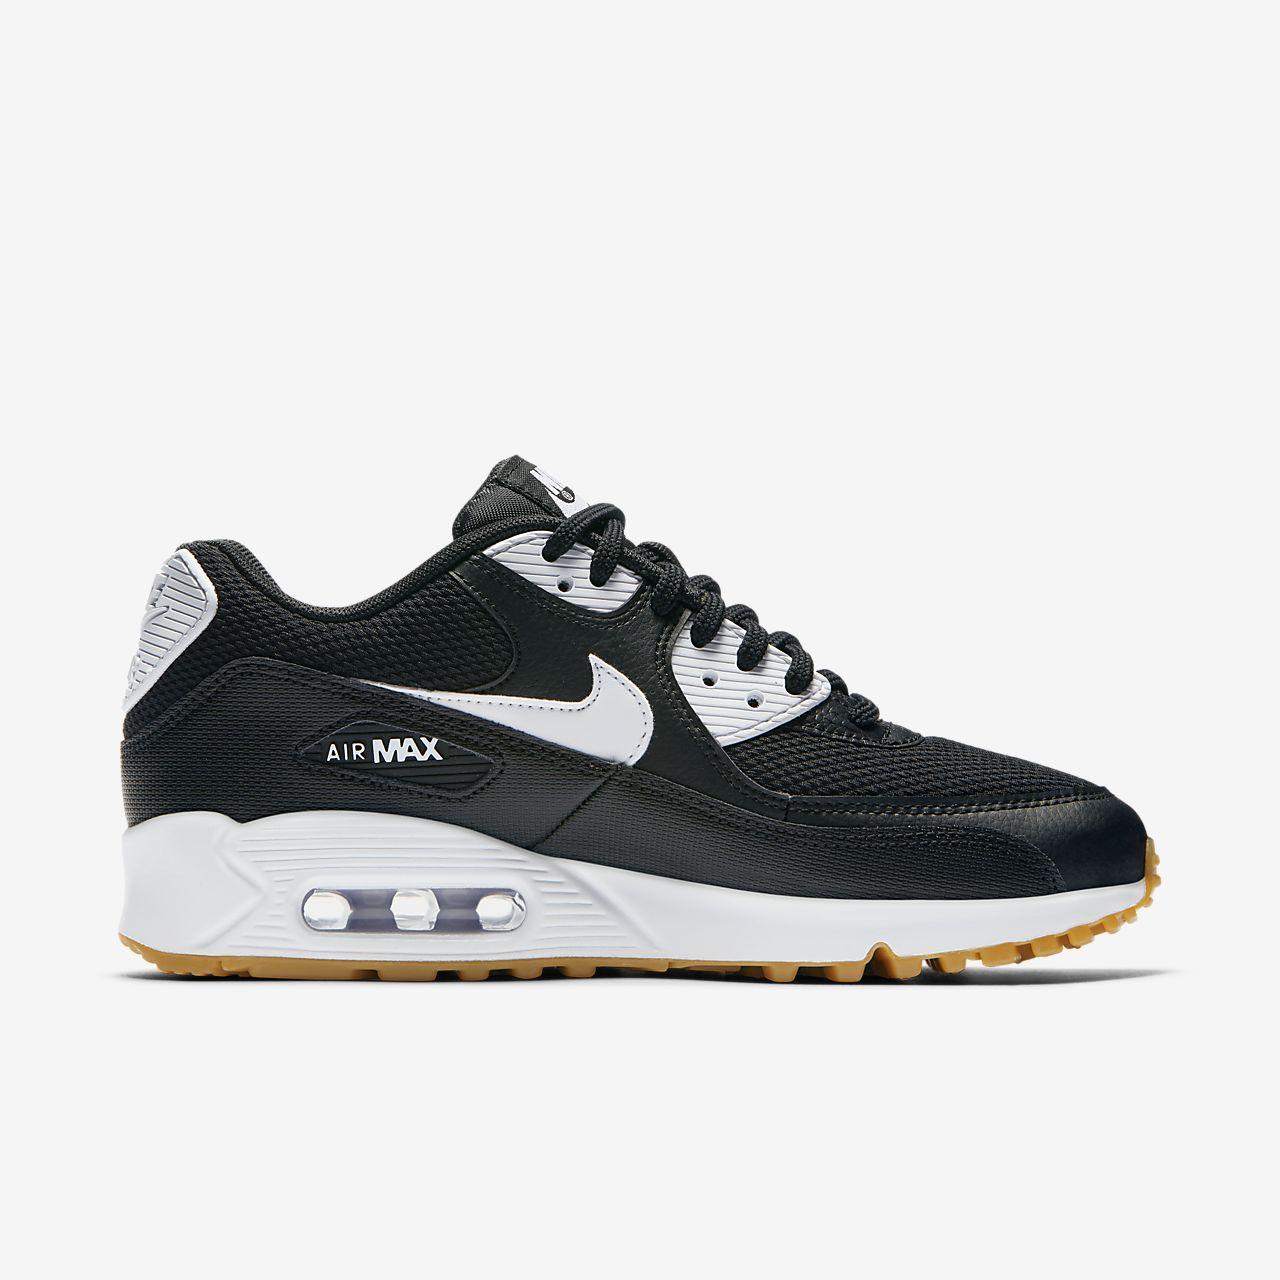 e6394e54e52 scarpa nike air max 90 nero gum light brown bianco bianco 325213-055